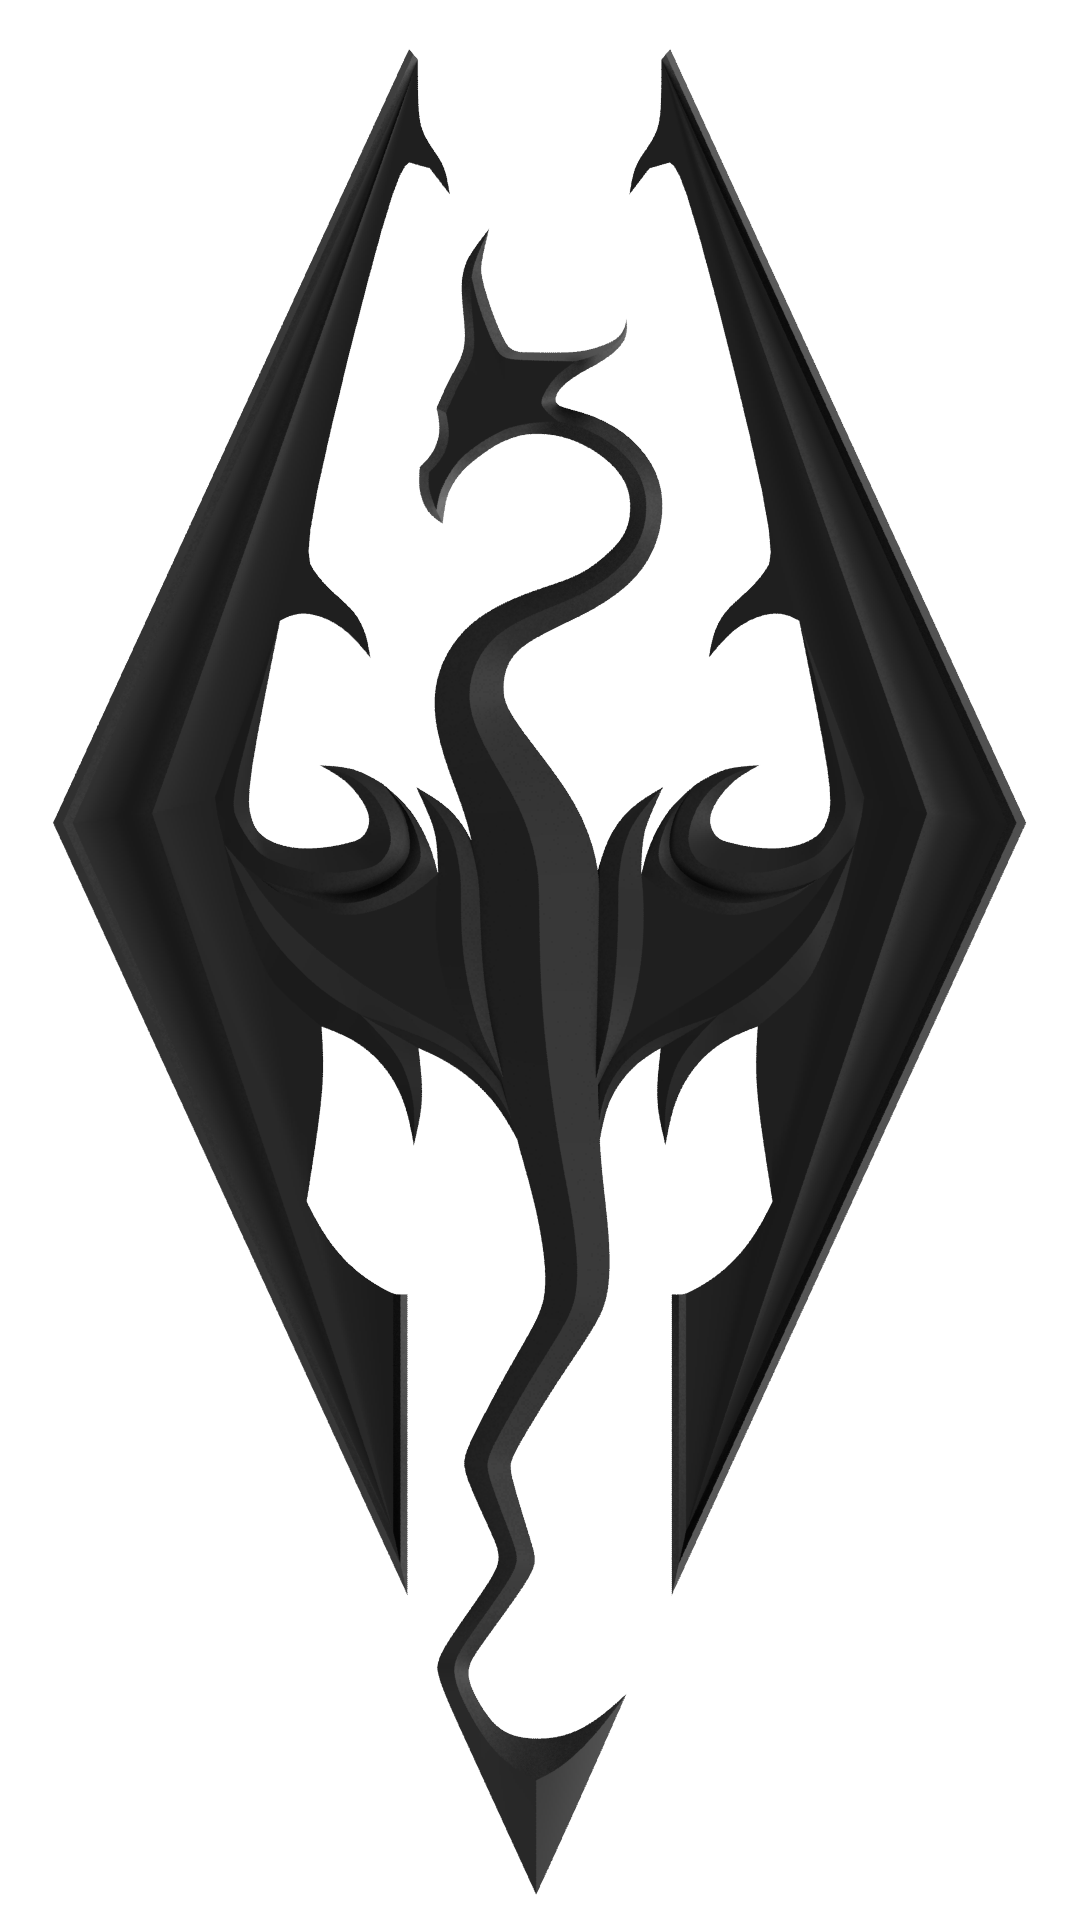 Pin By Bo55man66 On Skyrim Skyrim Skyrim Skyrim Tattoo Skyrim Dragon Dragon Wall Art